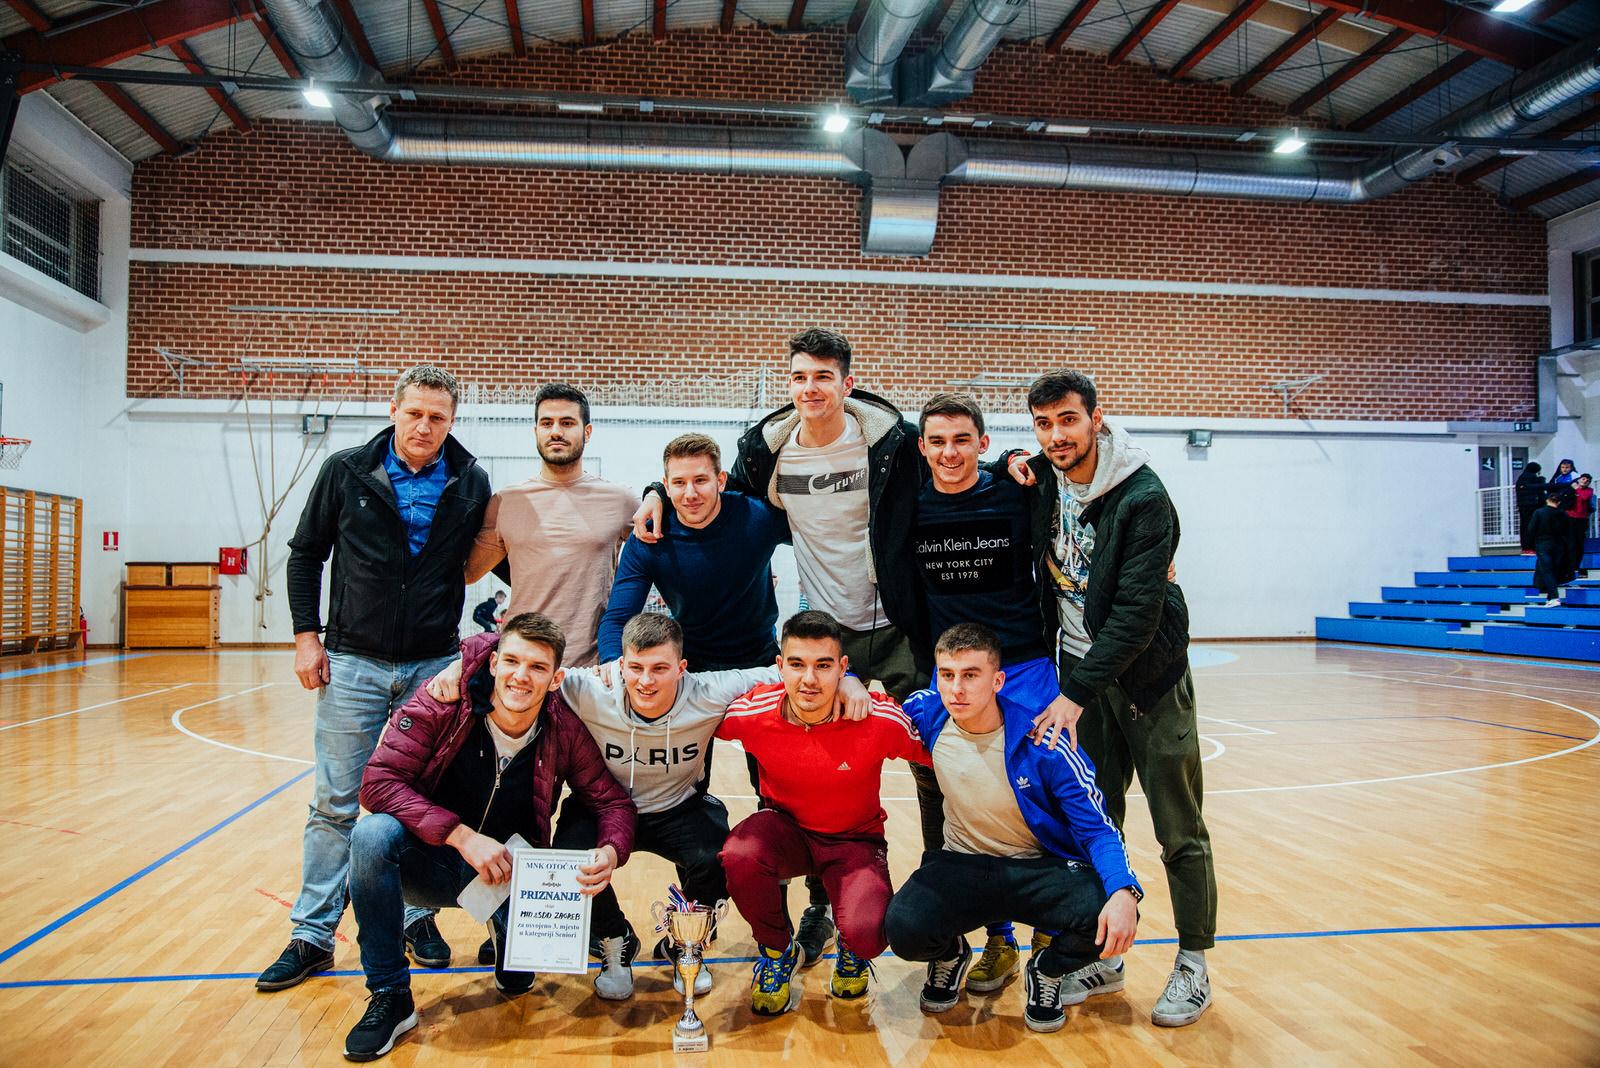 likaclub_otočac_memorijalni-malonogometni-turnir_2019-82